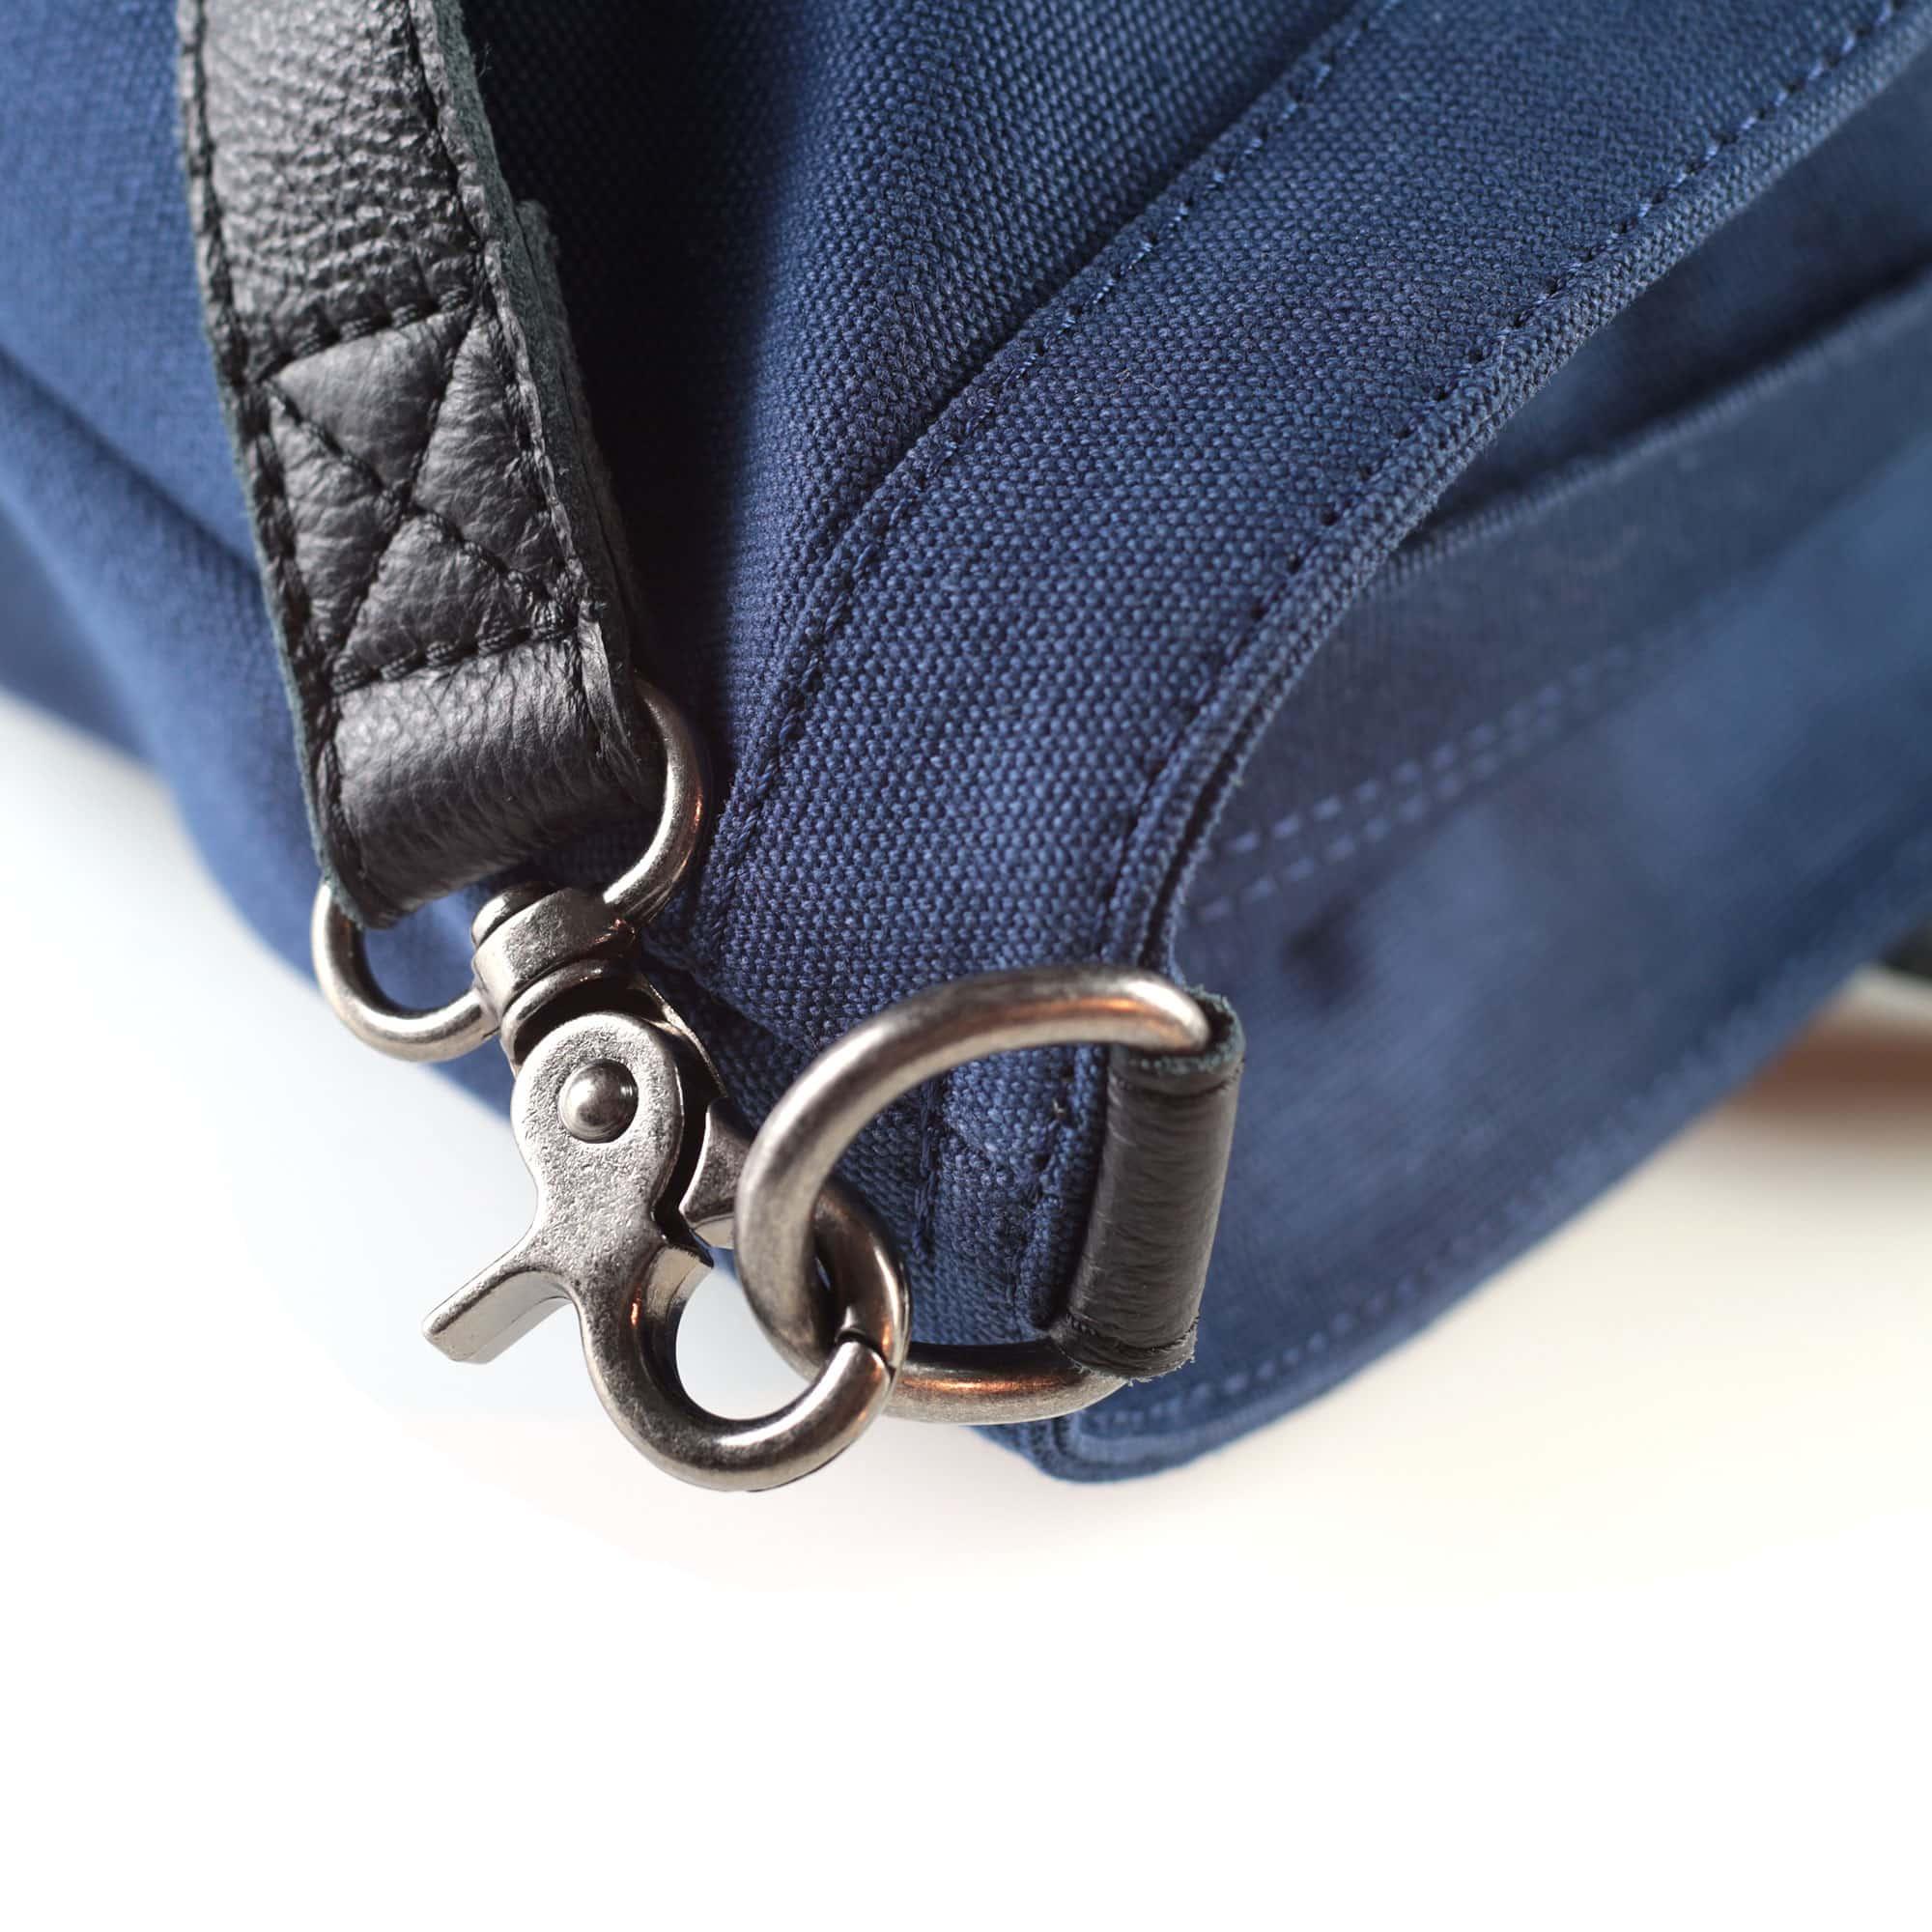 fahrradtasche montreal shopper detail blau